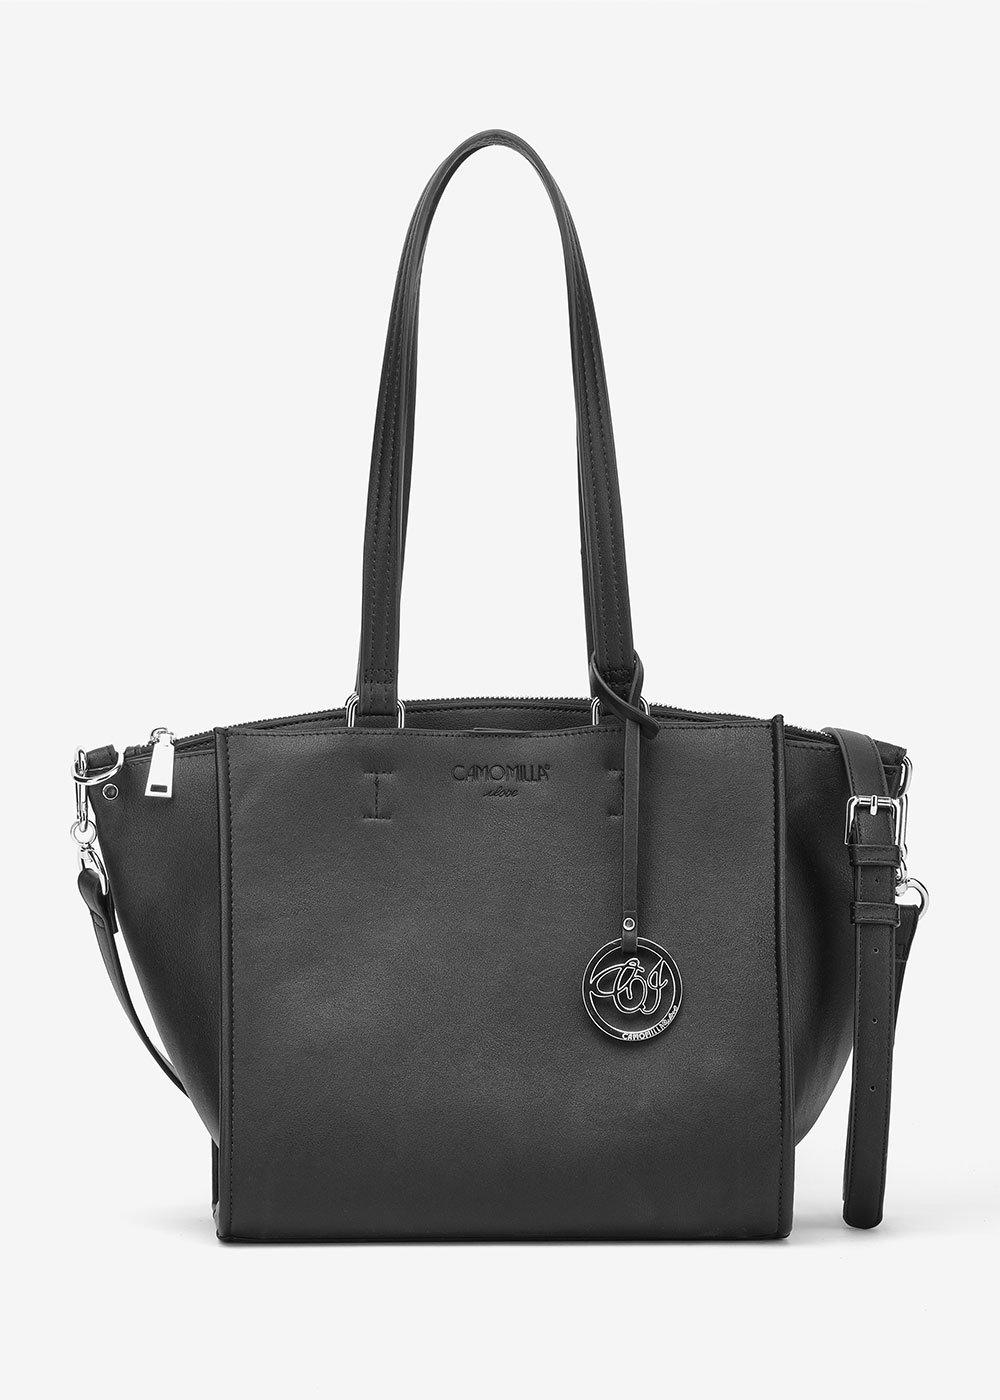 Baloo shopping bag with long handles - Black - Woman